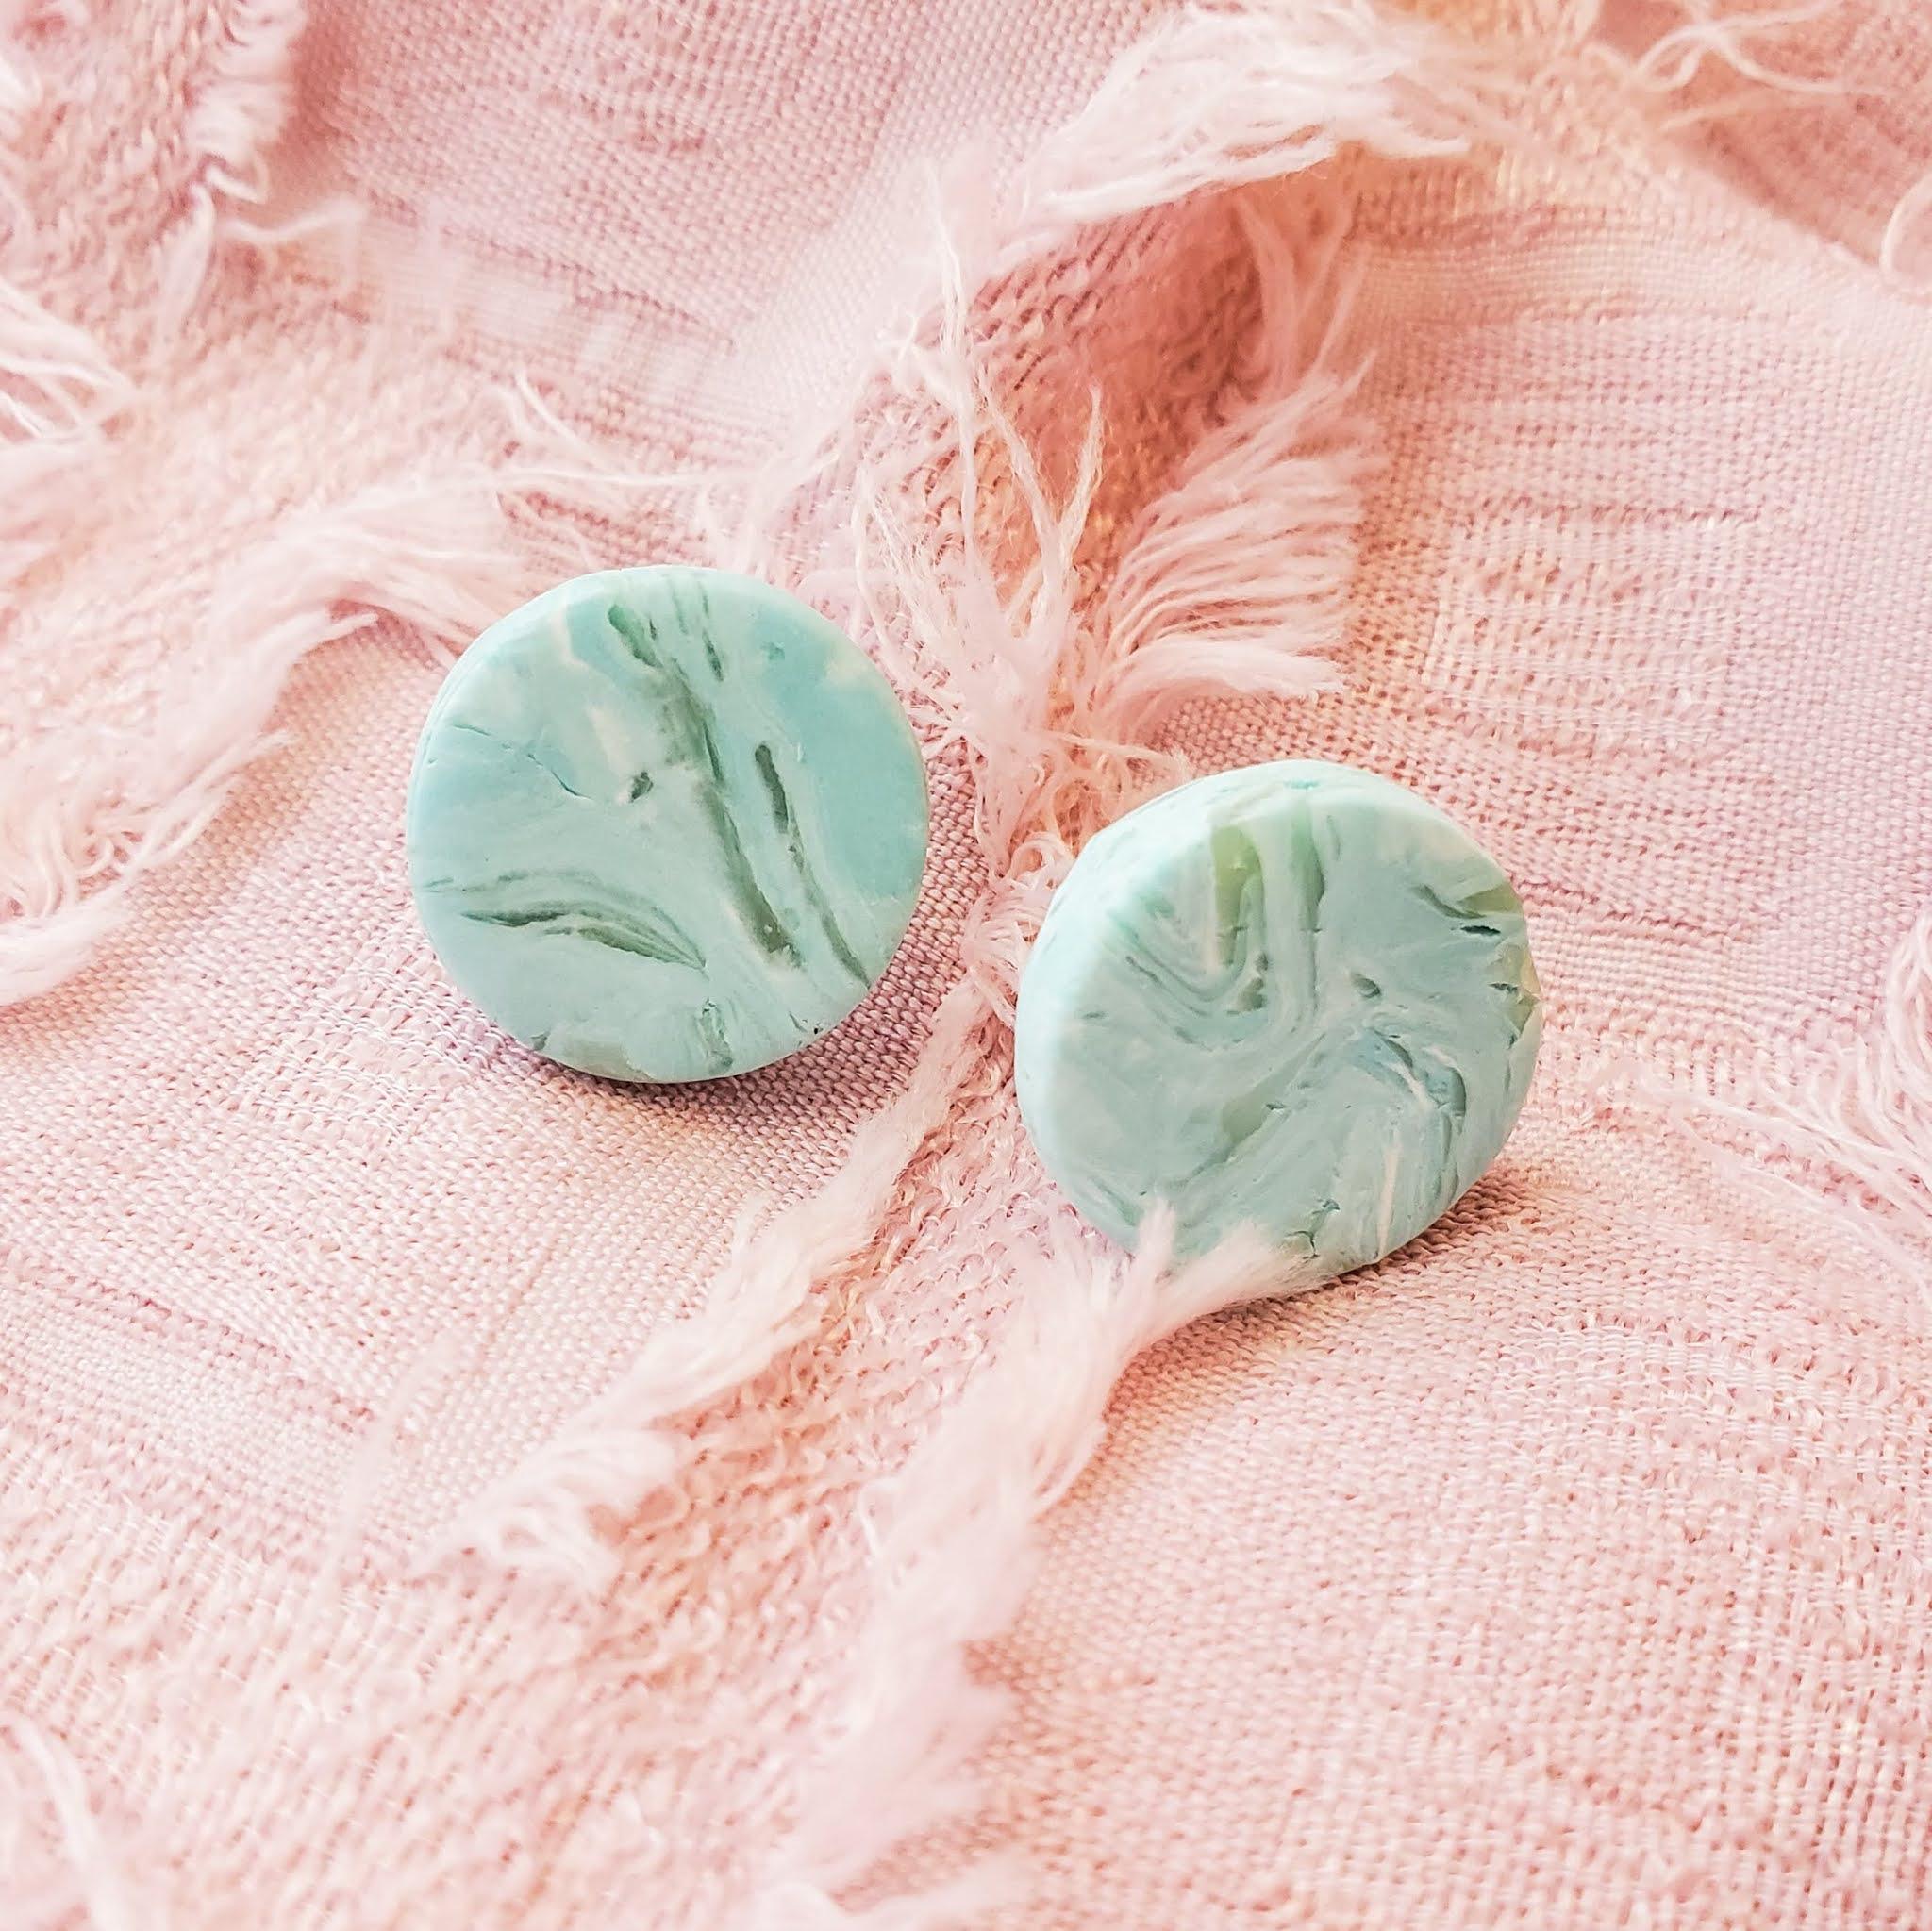 Polymer clay statement earrings - mini stella studs